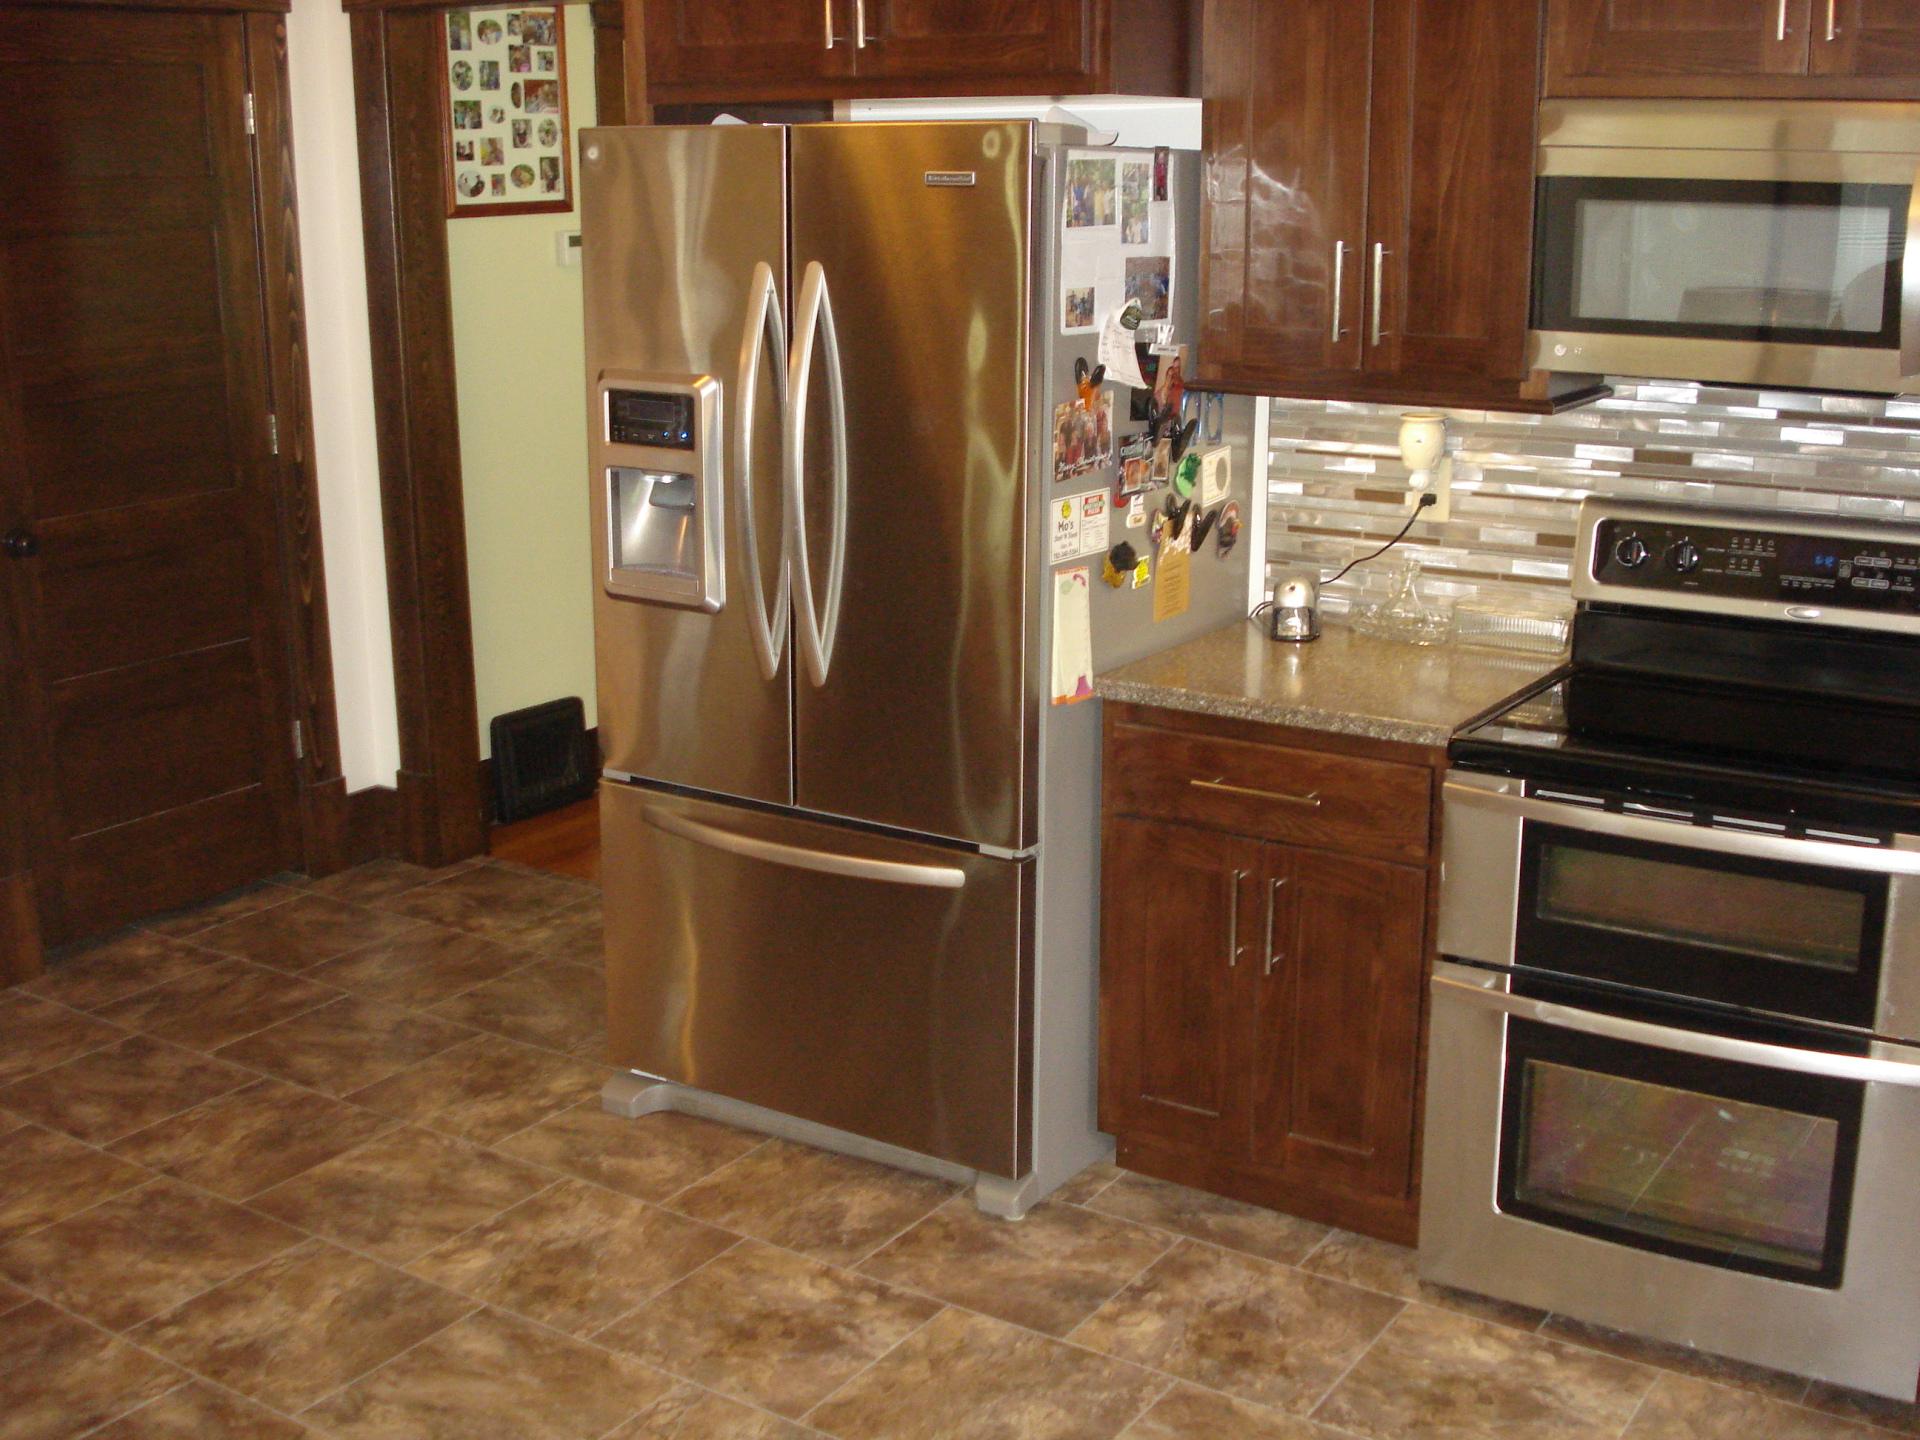 View of kitchen  Linn  Kansas  house for sale